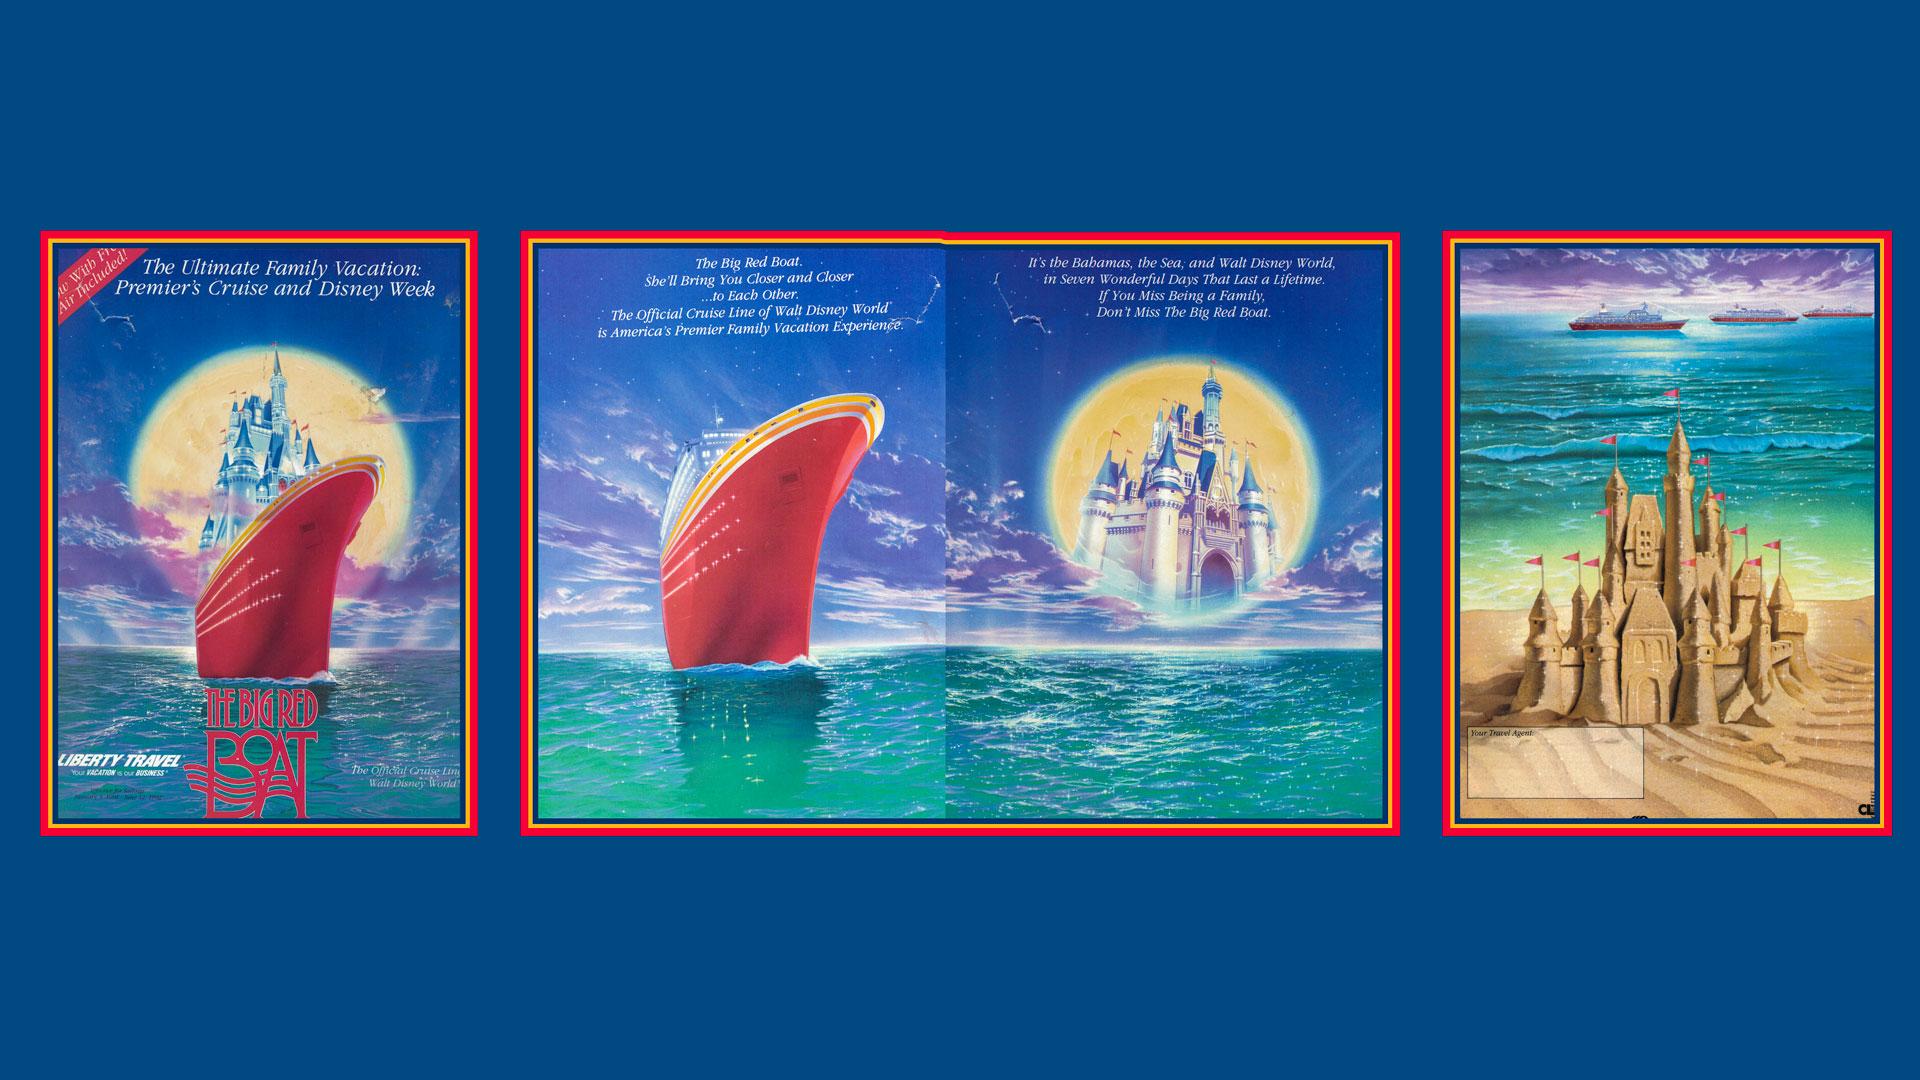 Premier Cruise Line Big Red Boat Booklet 1991 92